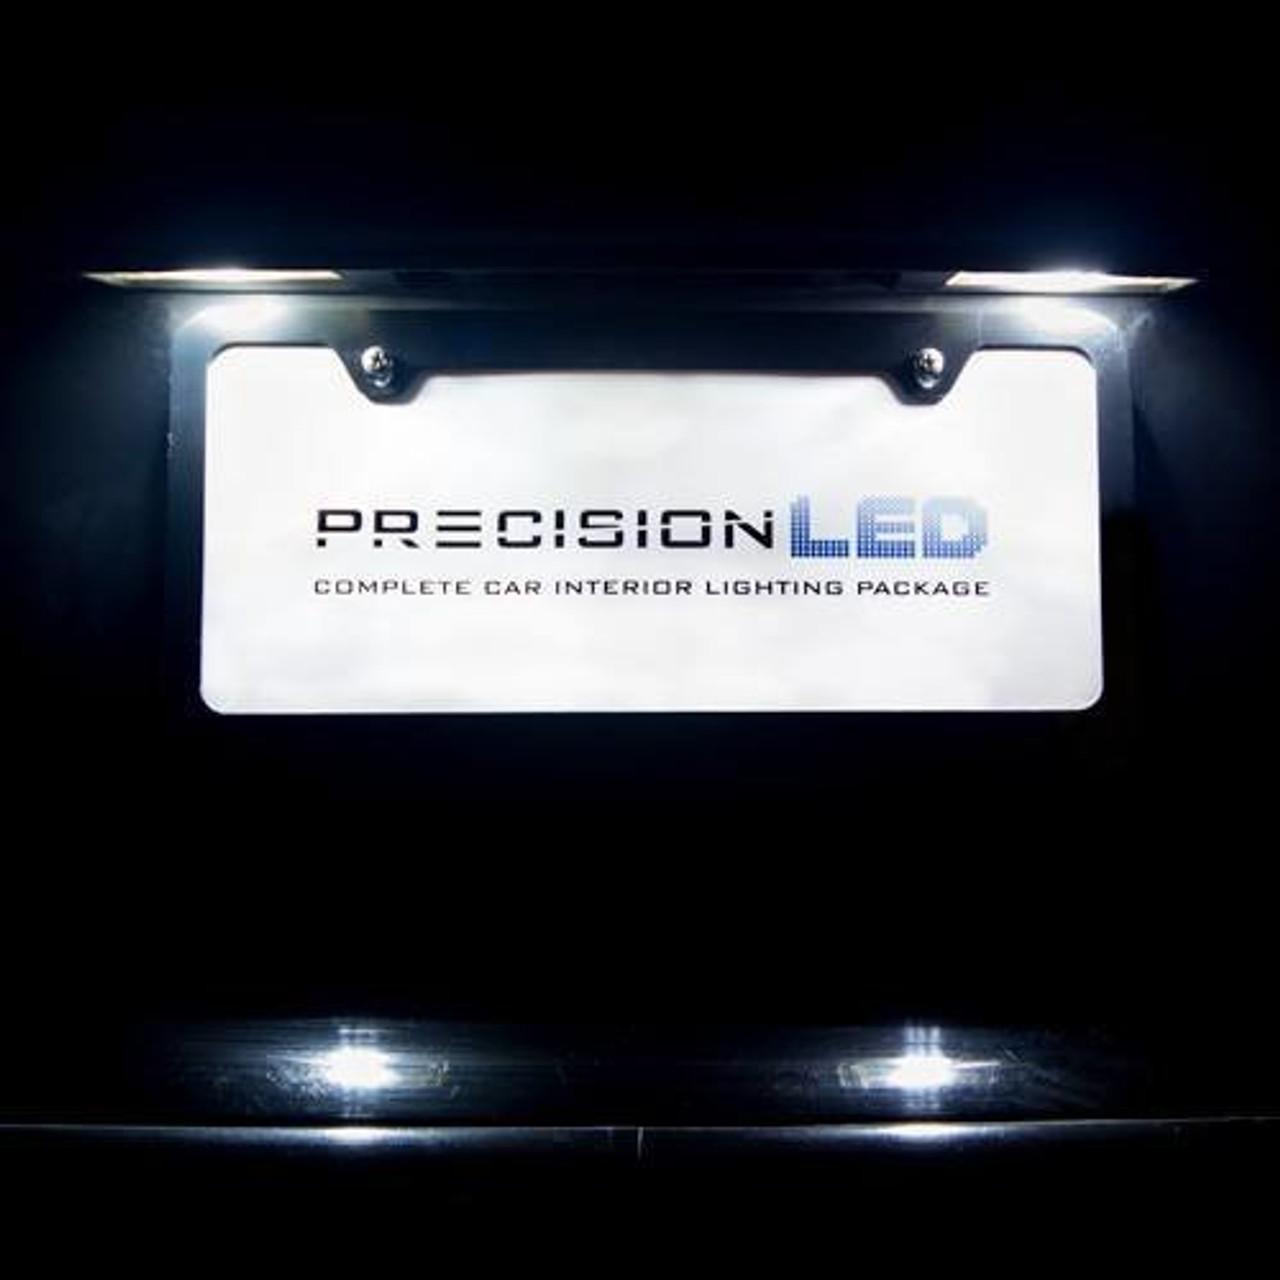 Jeep Patriot LED License Plate Lights (2007-Present)